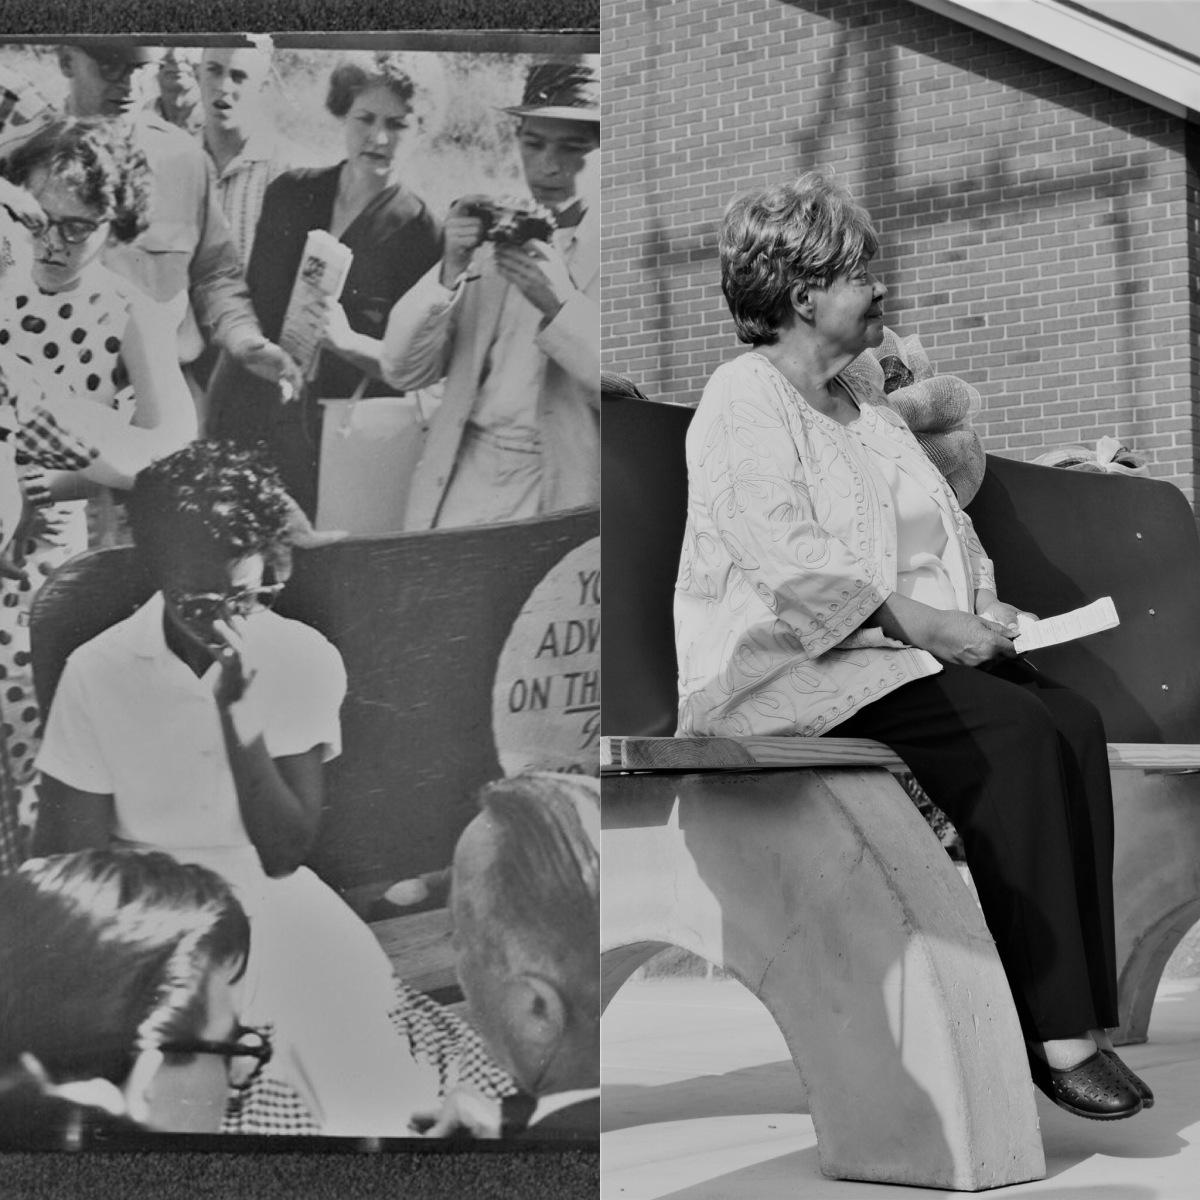 Dedication Of The Elizabeth Eckford Commemorative Bench